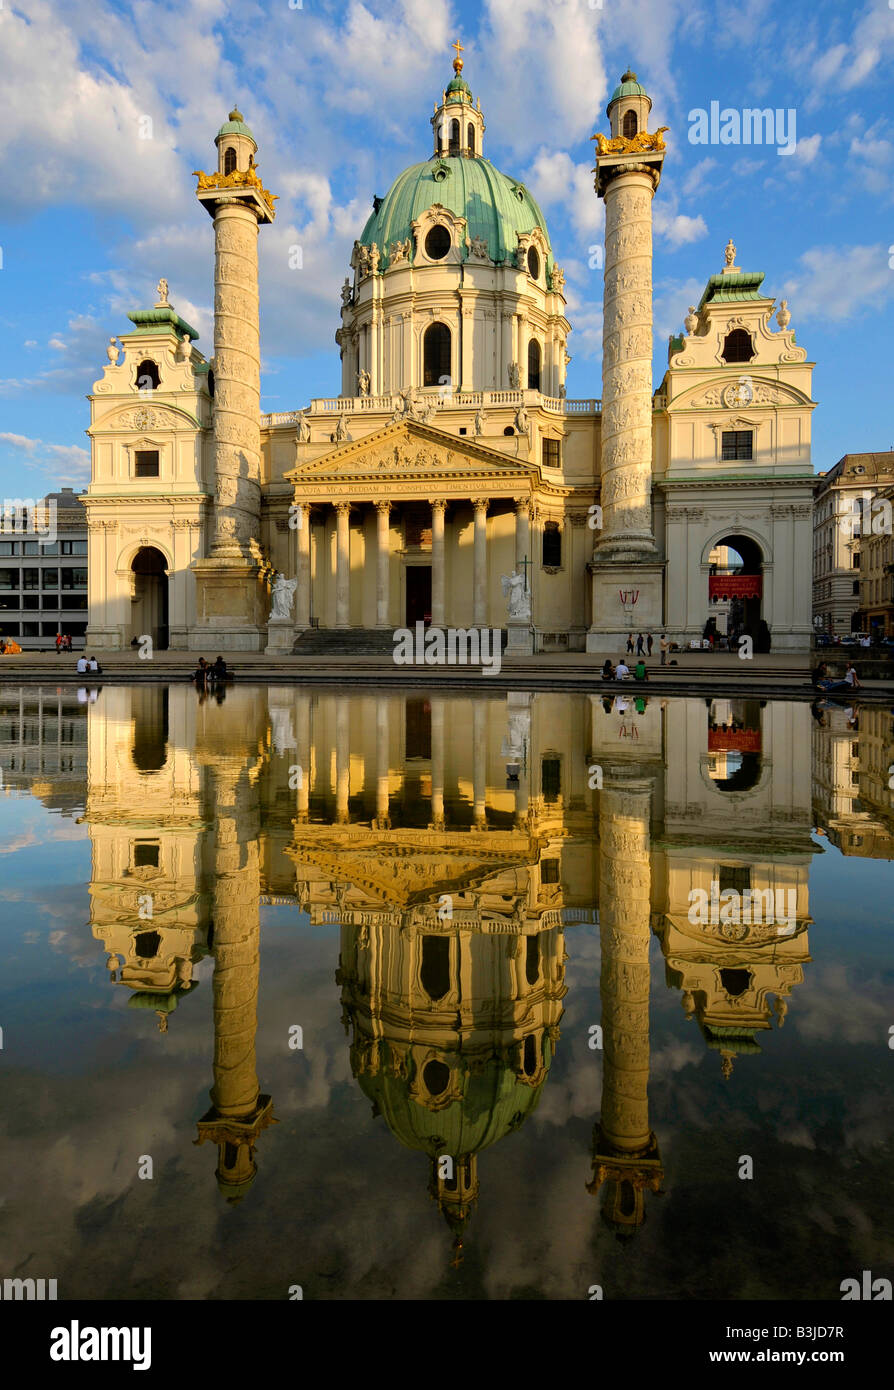 Karls Kirche, Karlskirche, St Charles' Church, Vienna, Austria - Stock Image